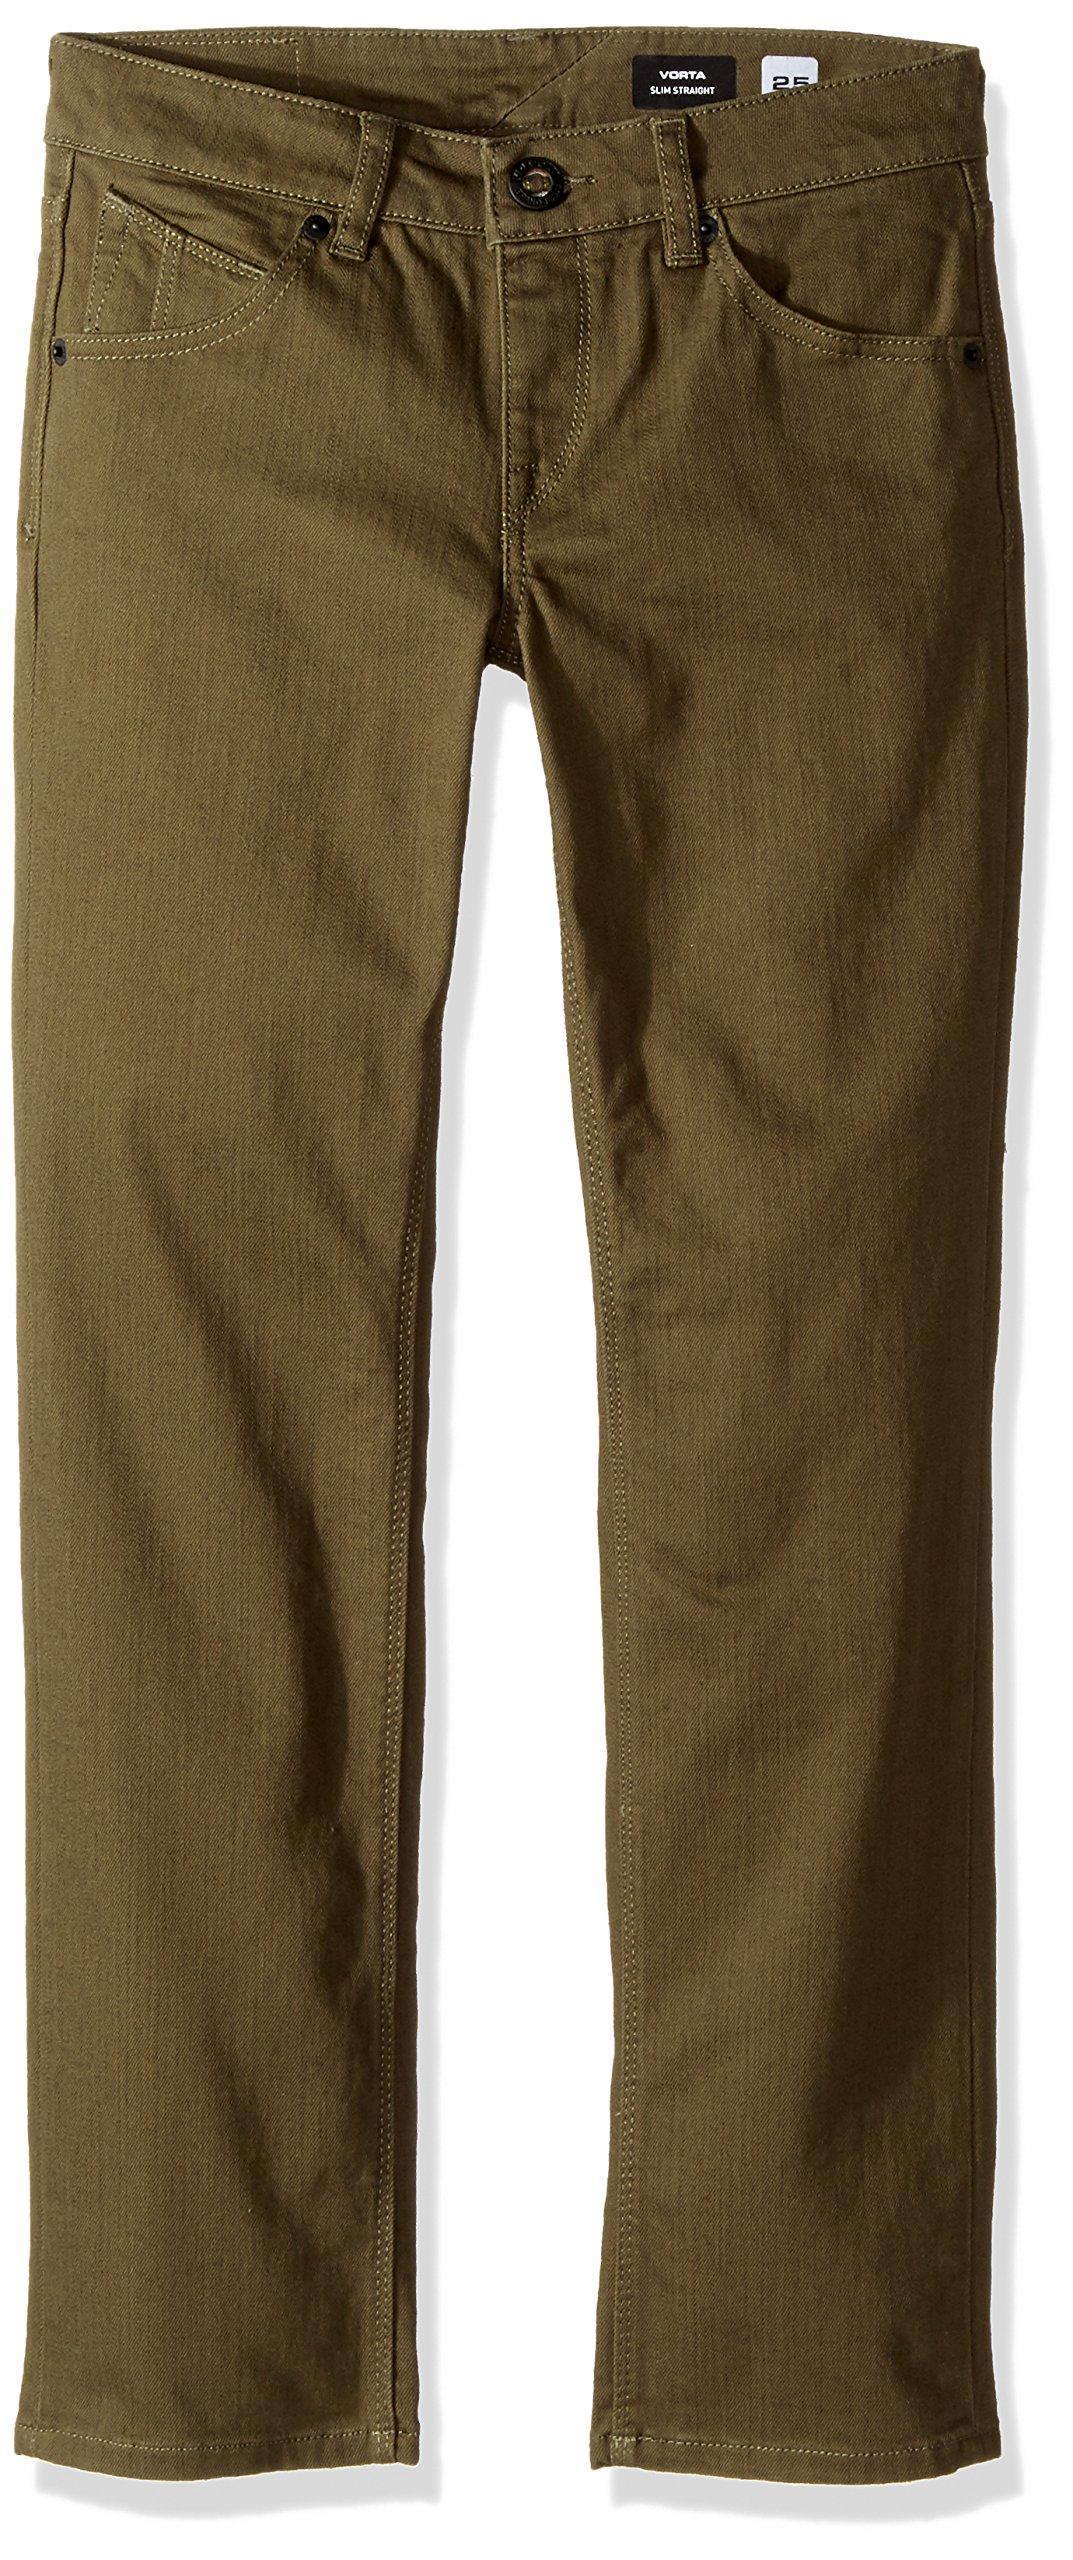 Volcom Big Boys' Vorta 5 Pocket Slub Pant, Military, 29